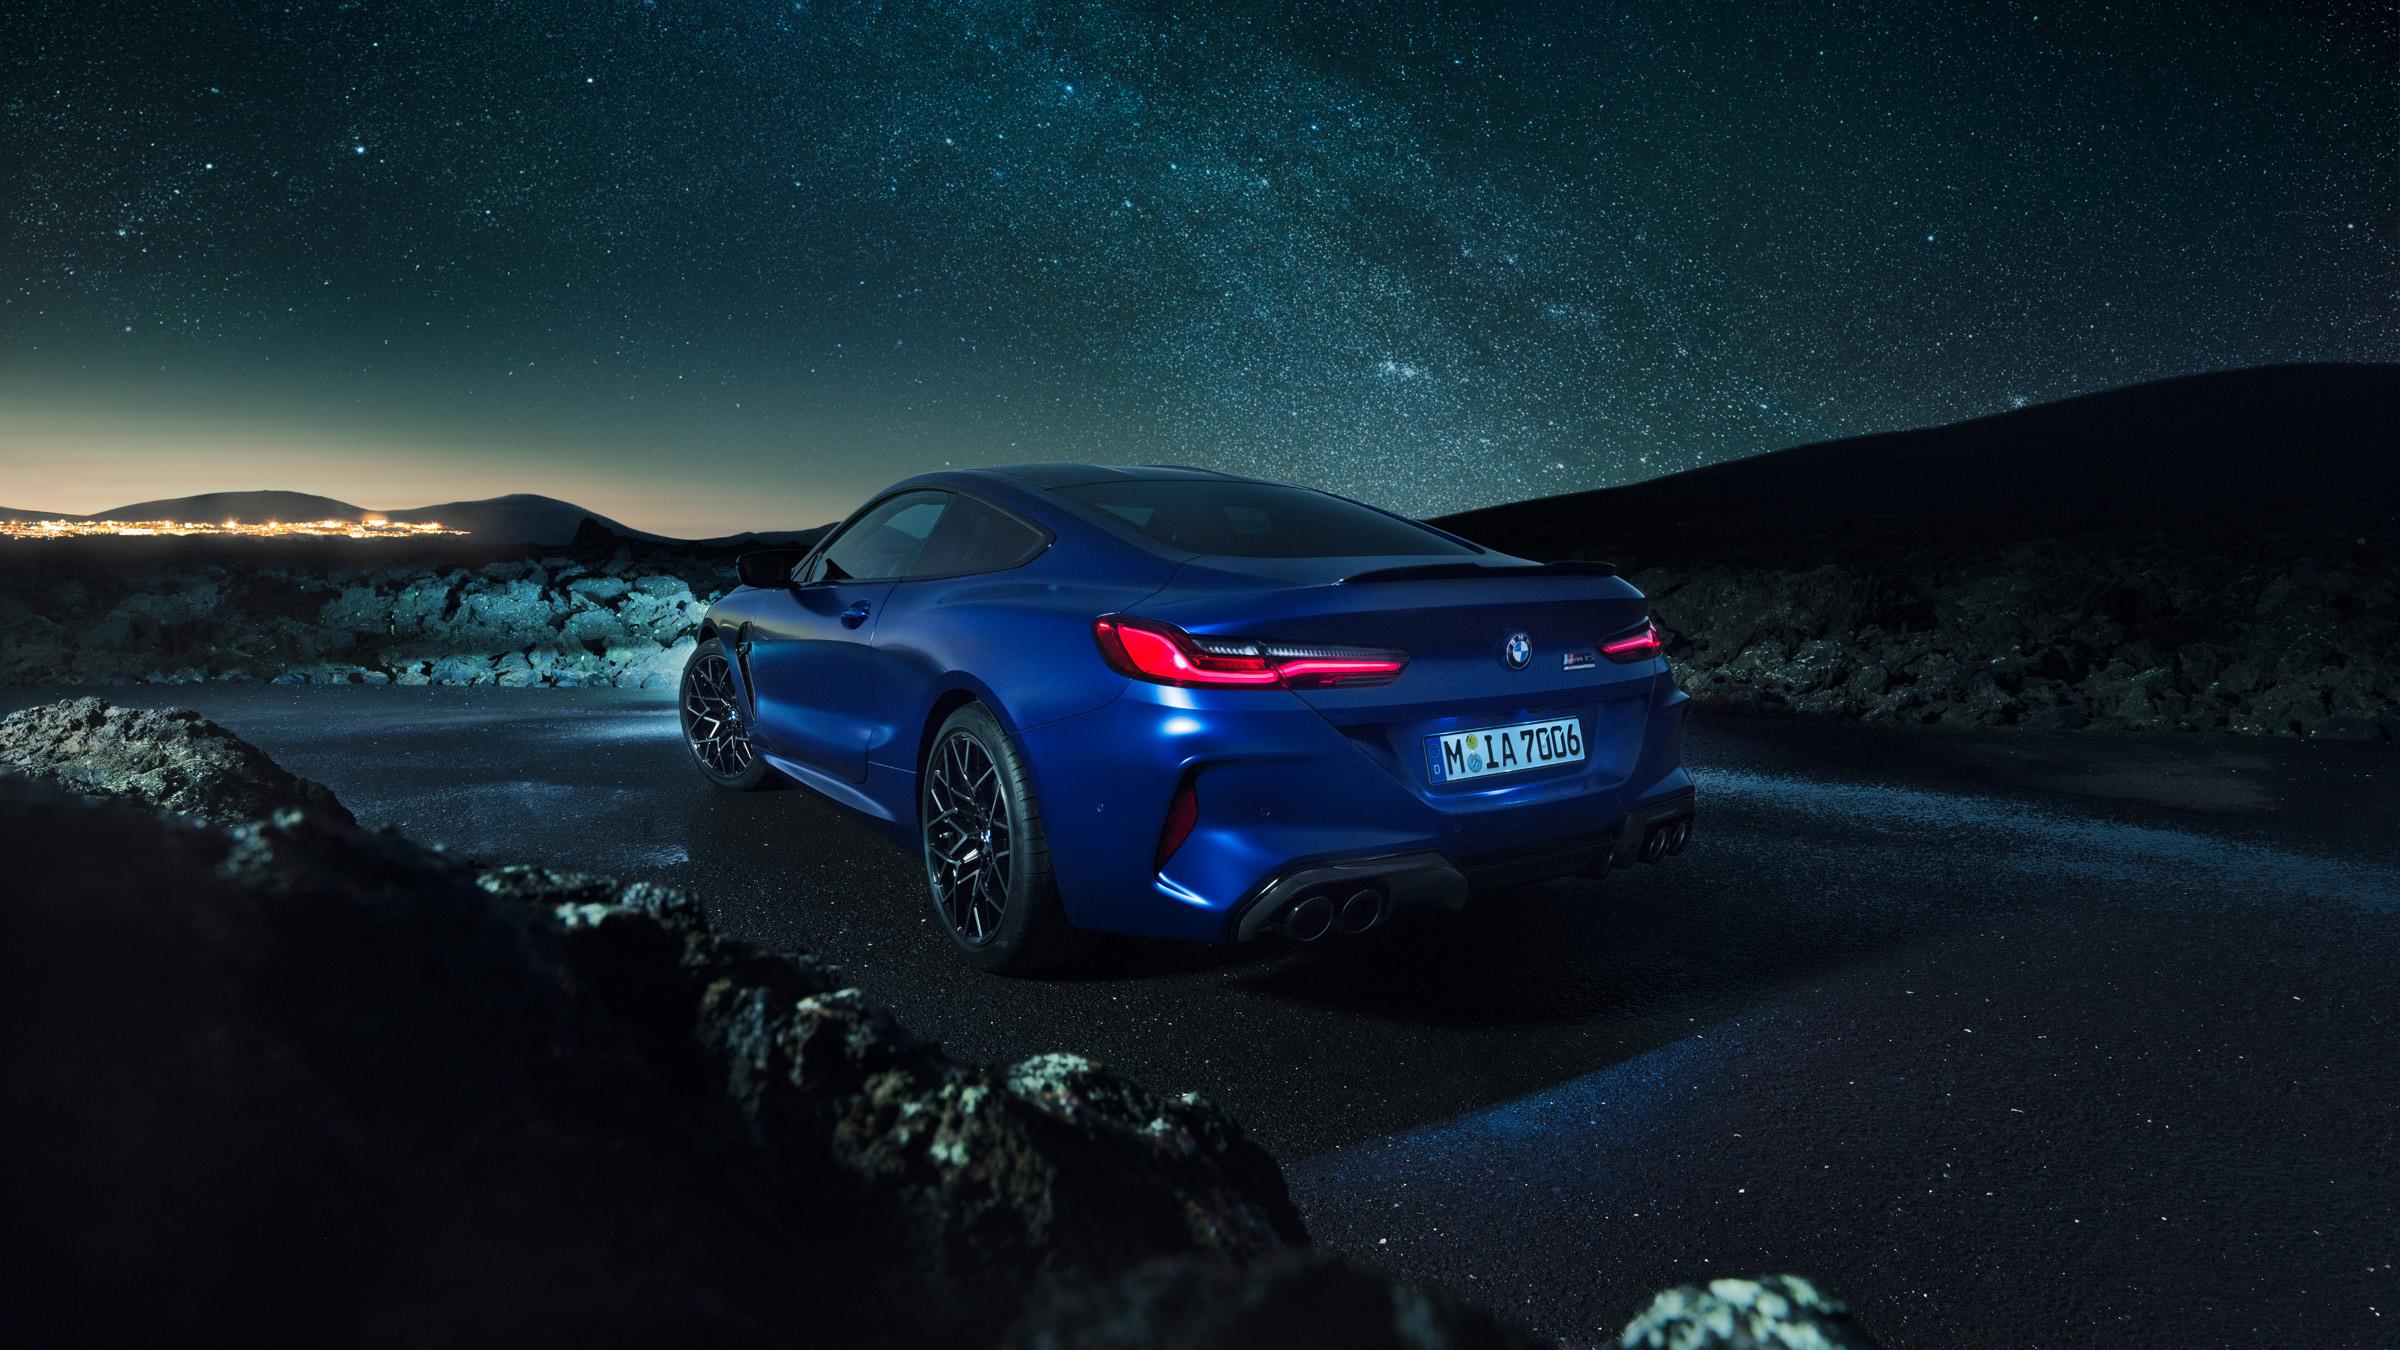 BMW_M8_COUPE_KONRAD_SCHMIDT_03_2400x1350